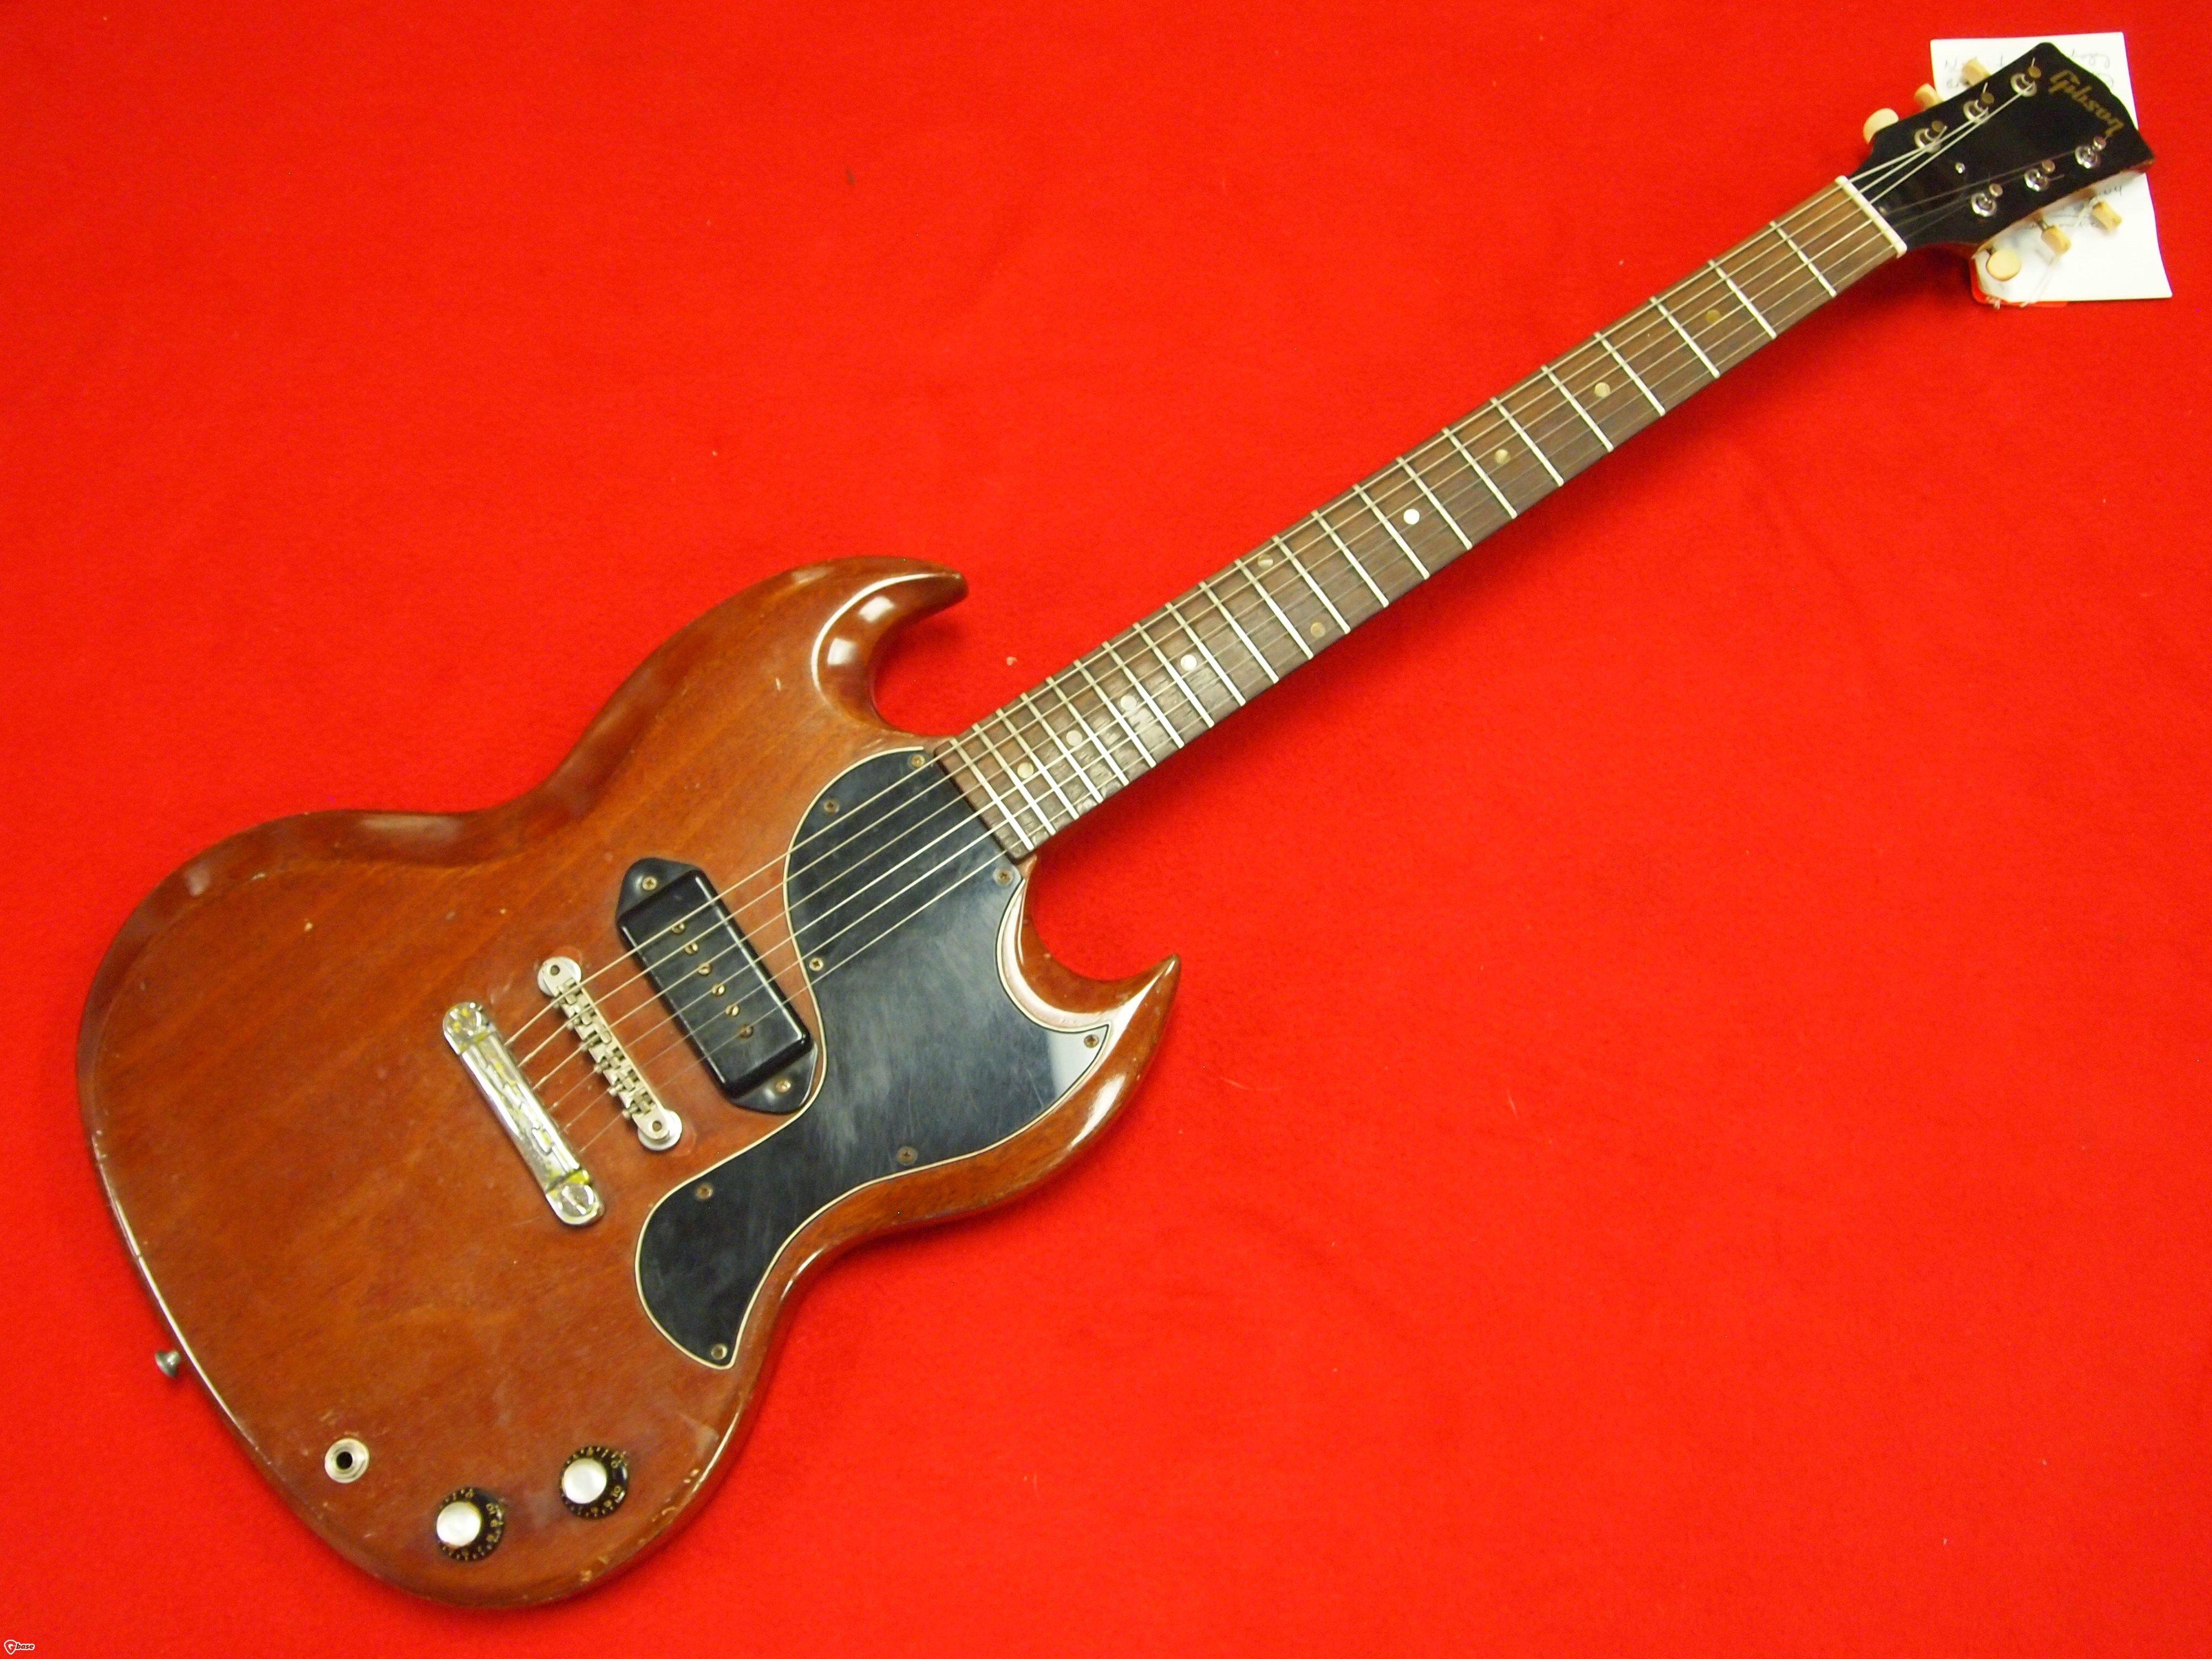 hight resolution of 10 0973 1964 sg junior neck 1 piece mahogany body 1 piece mahogany nut original tuners original kluson deluxe frets original pickup original dogear